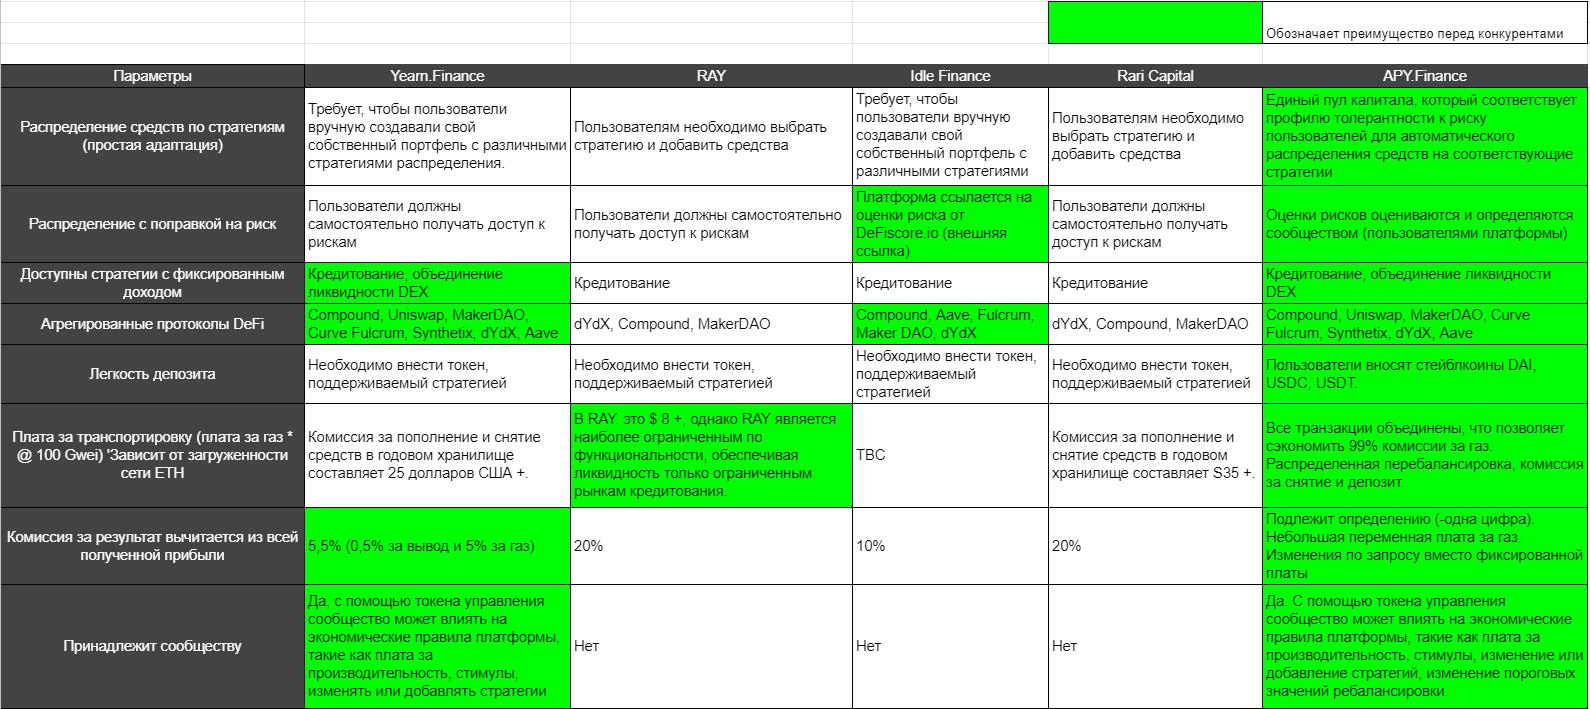 Анализ конкурентов APY.Finance